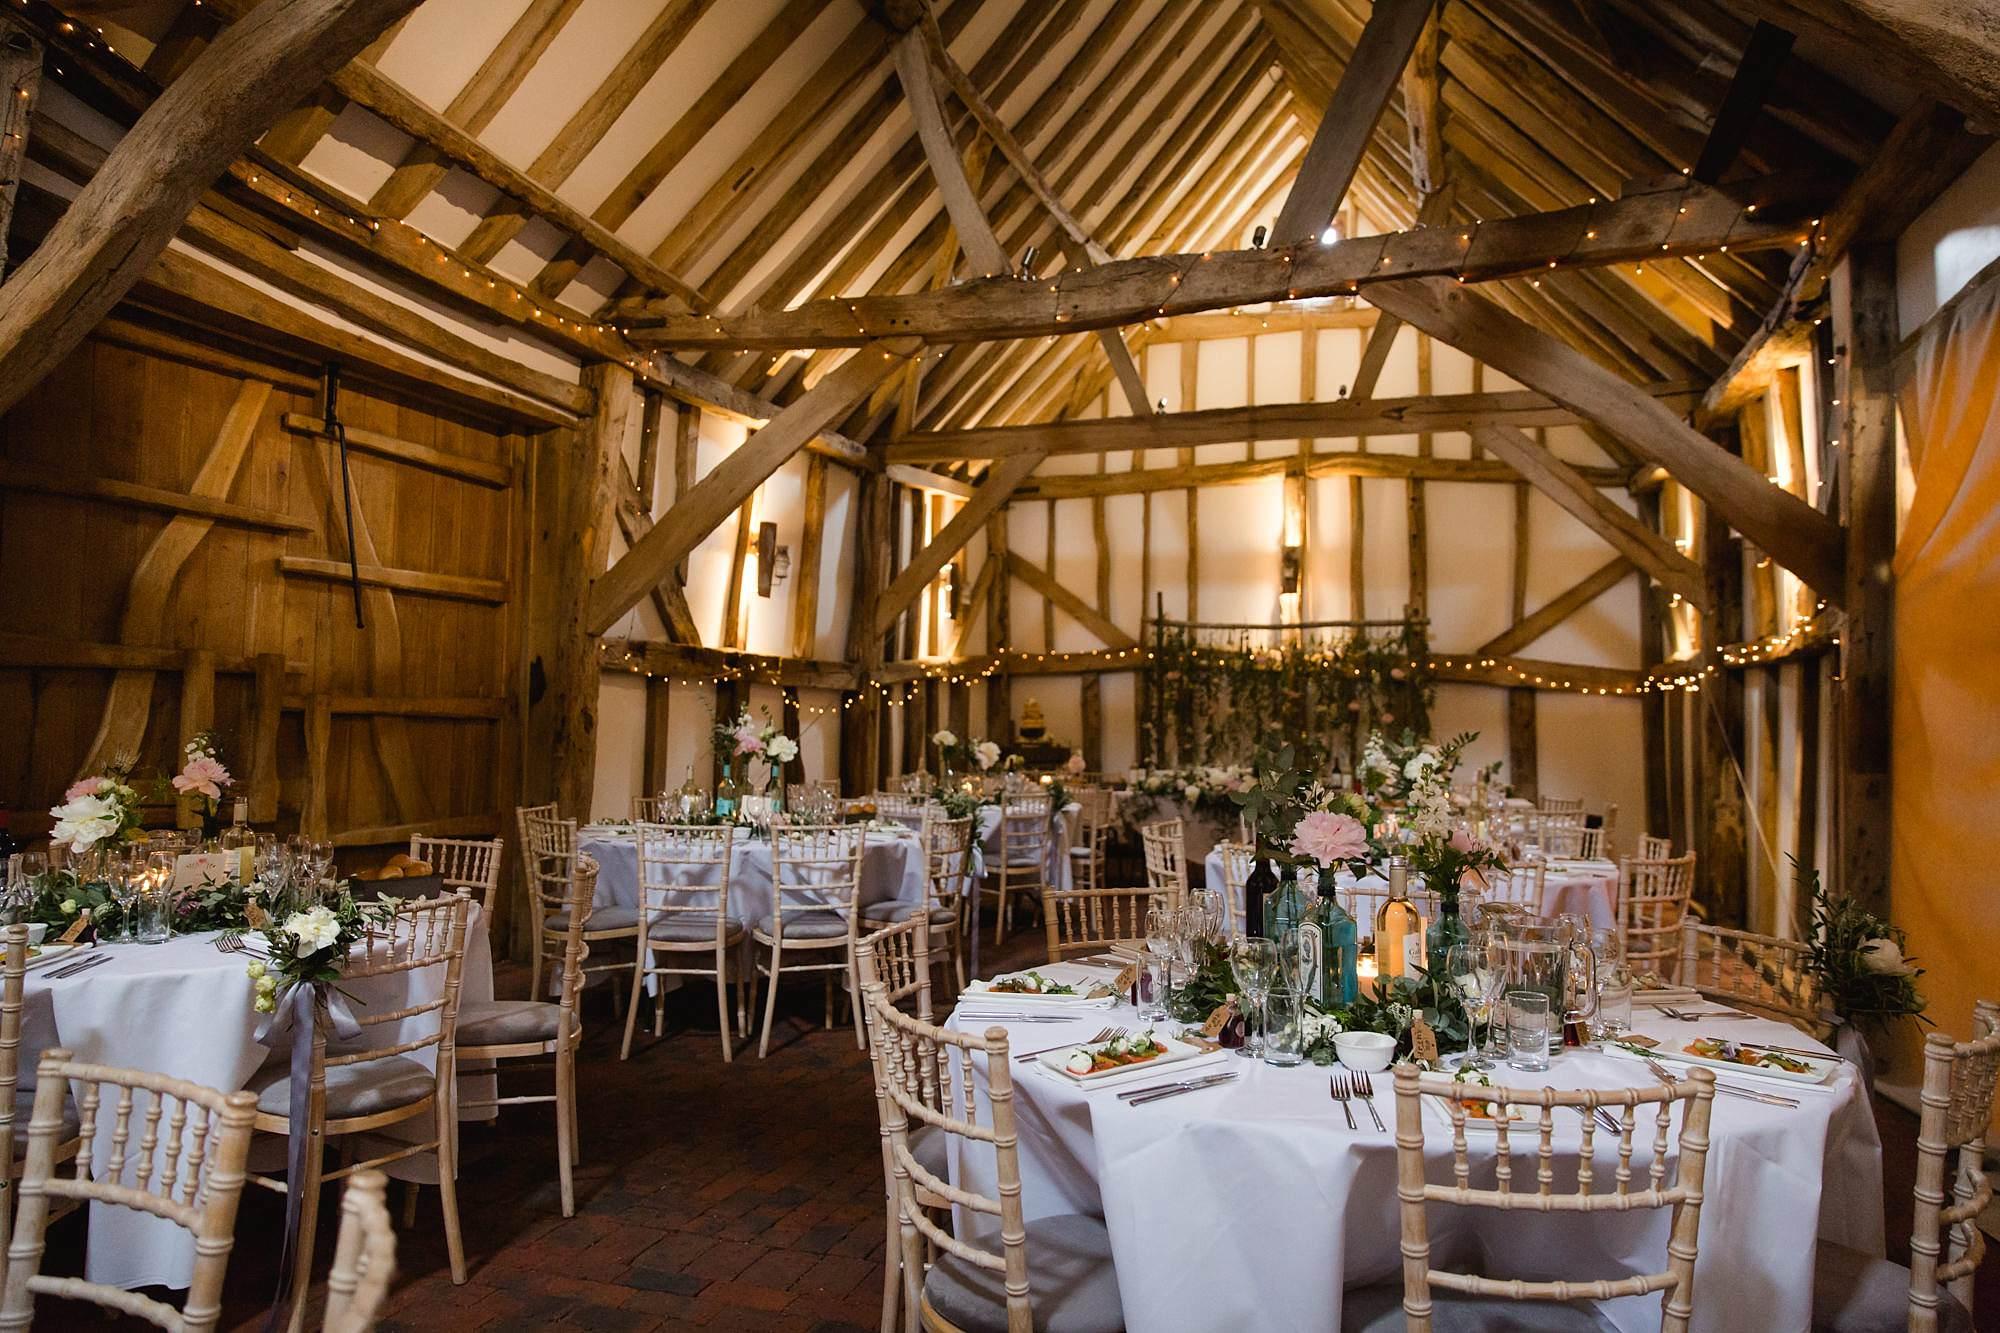 humanist wedding old greens barn setup for wedding breakfast